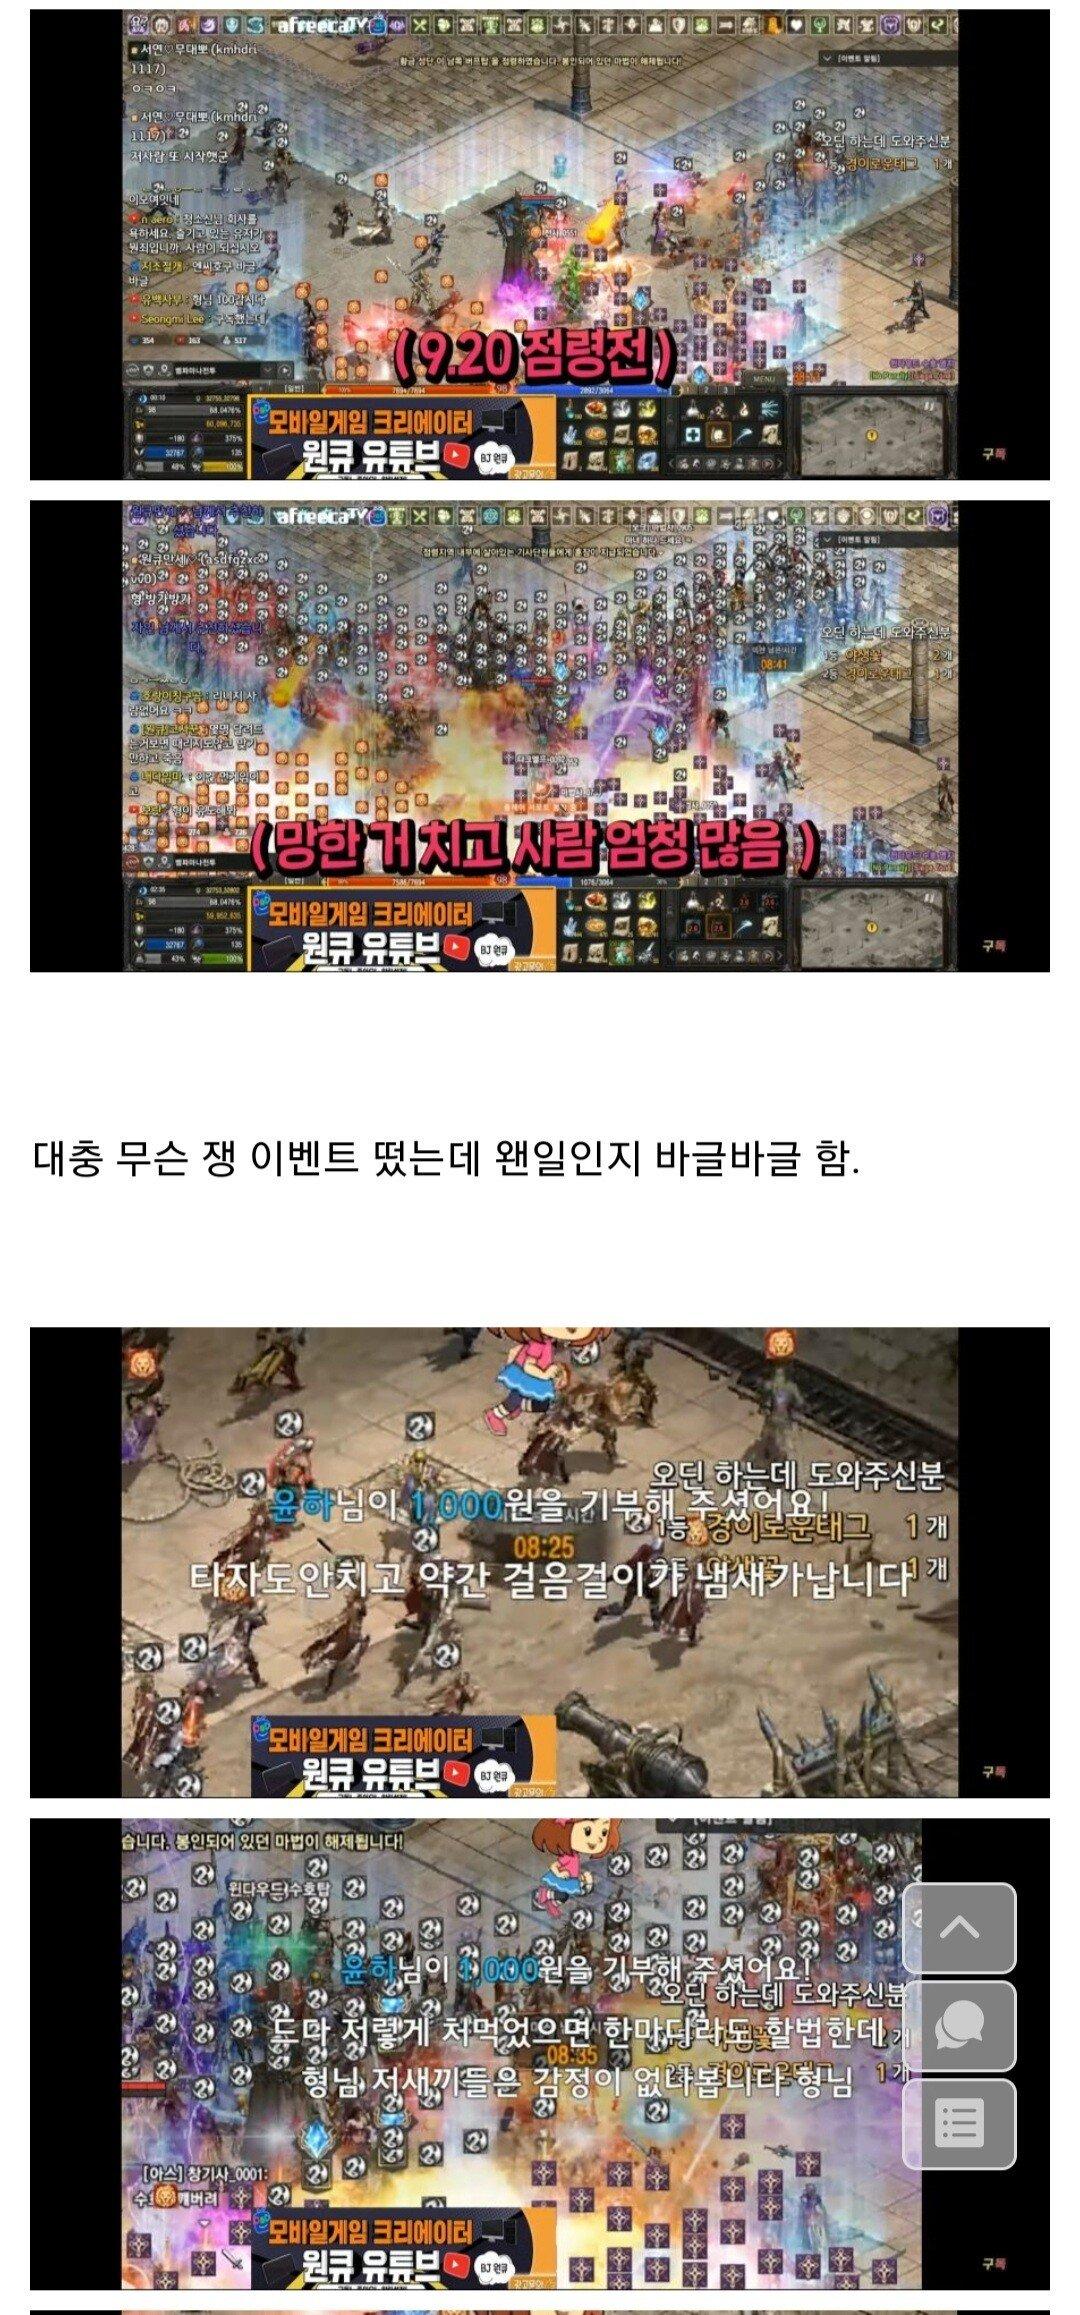 1632130341_Screenshot_20210920_182919_Samsung_Internet.jpg 리니지 근황.jpg